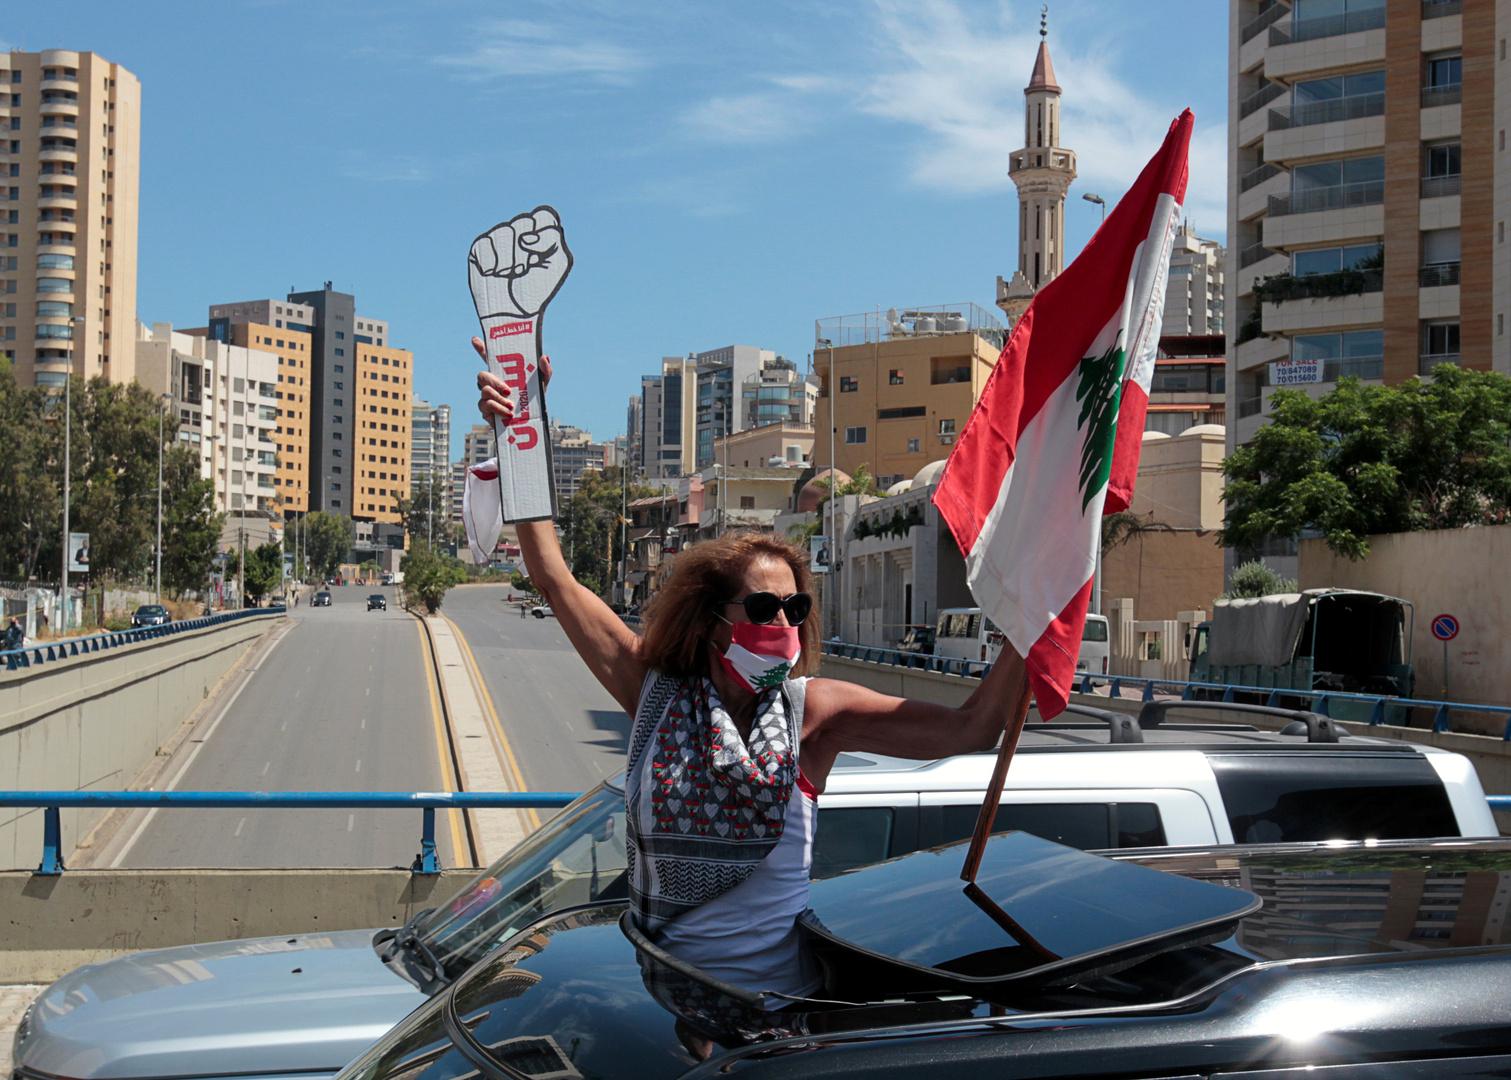 احتجاجات لبنان، مايو 2020